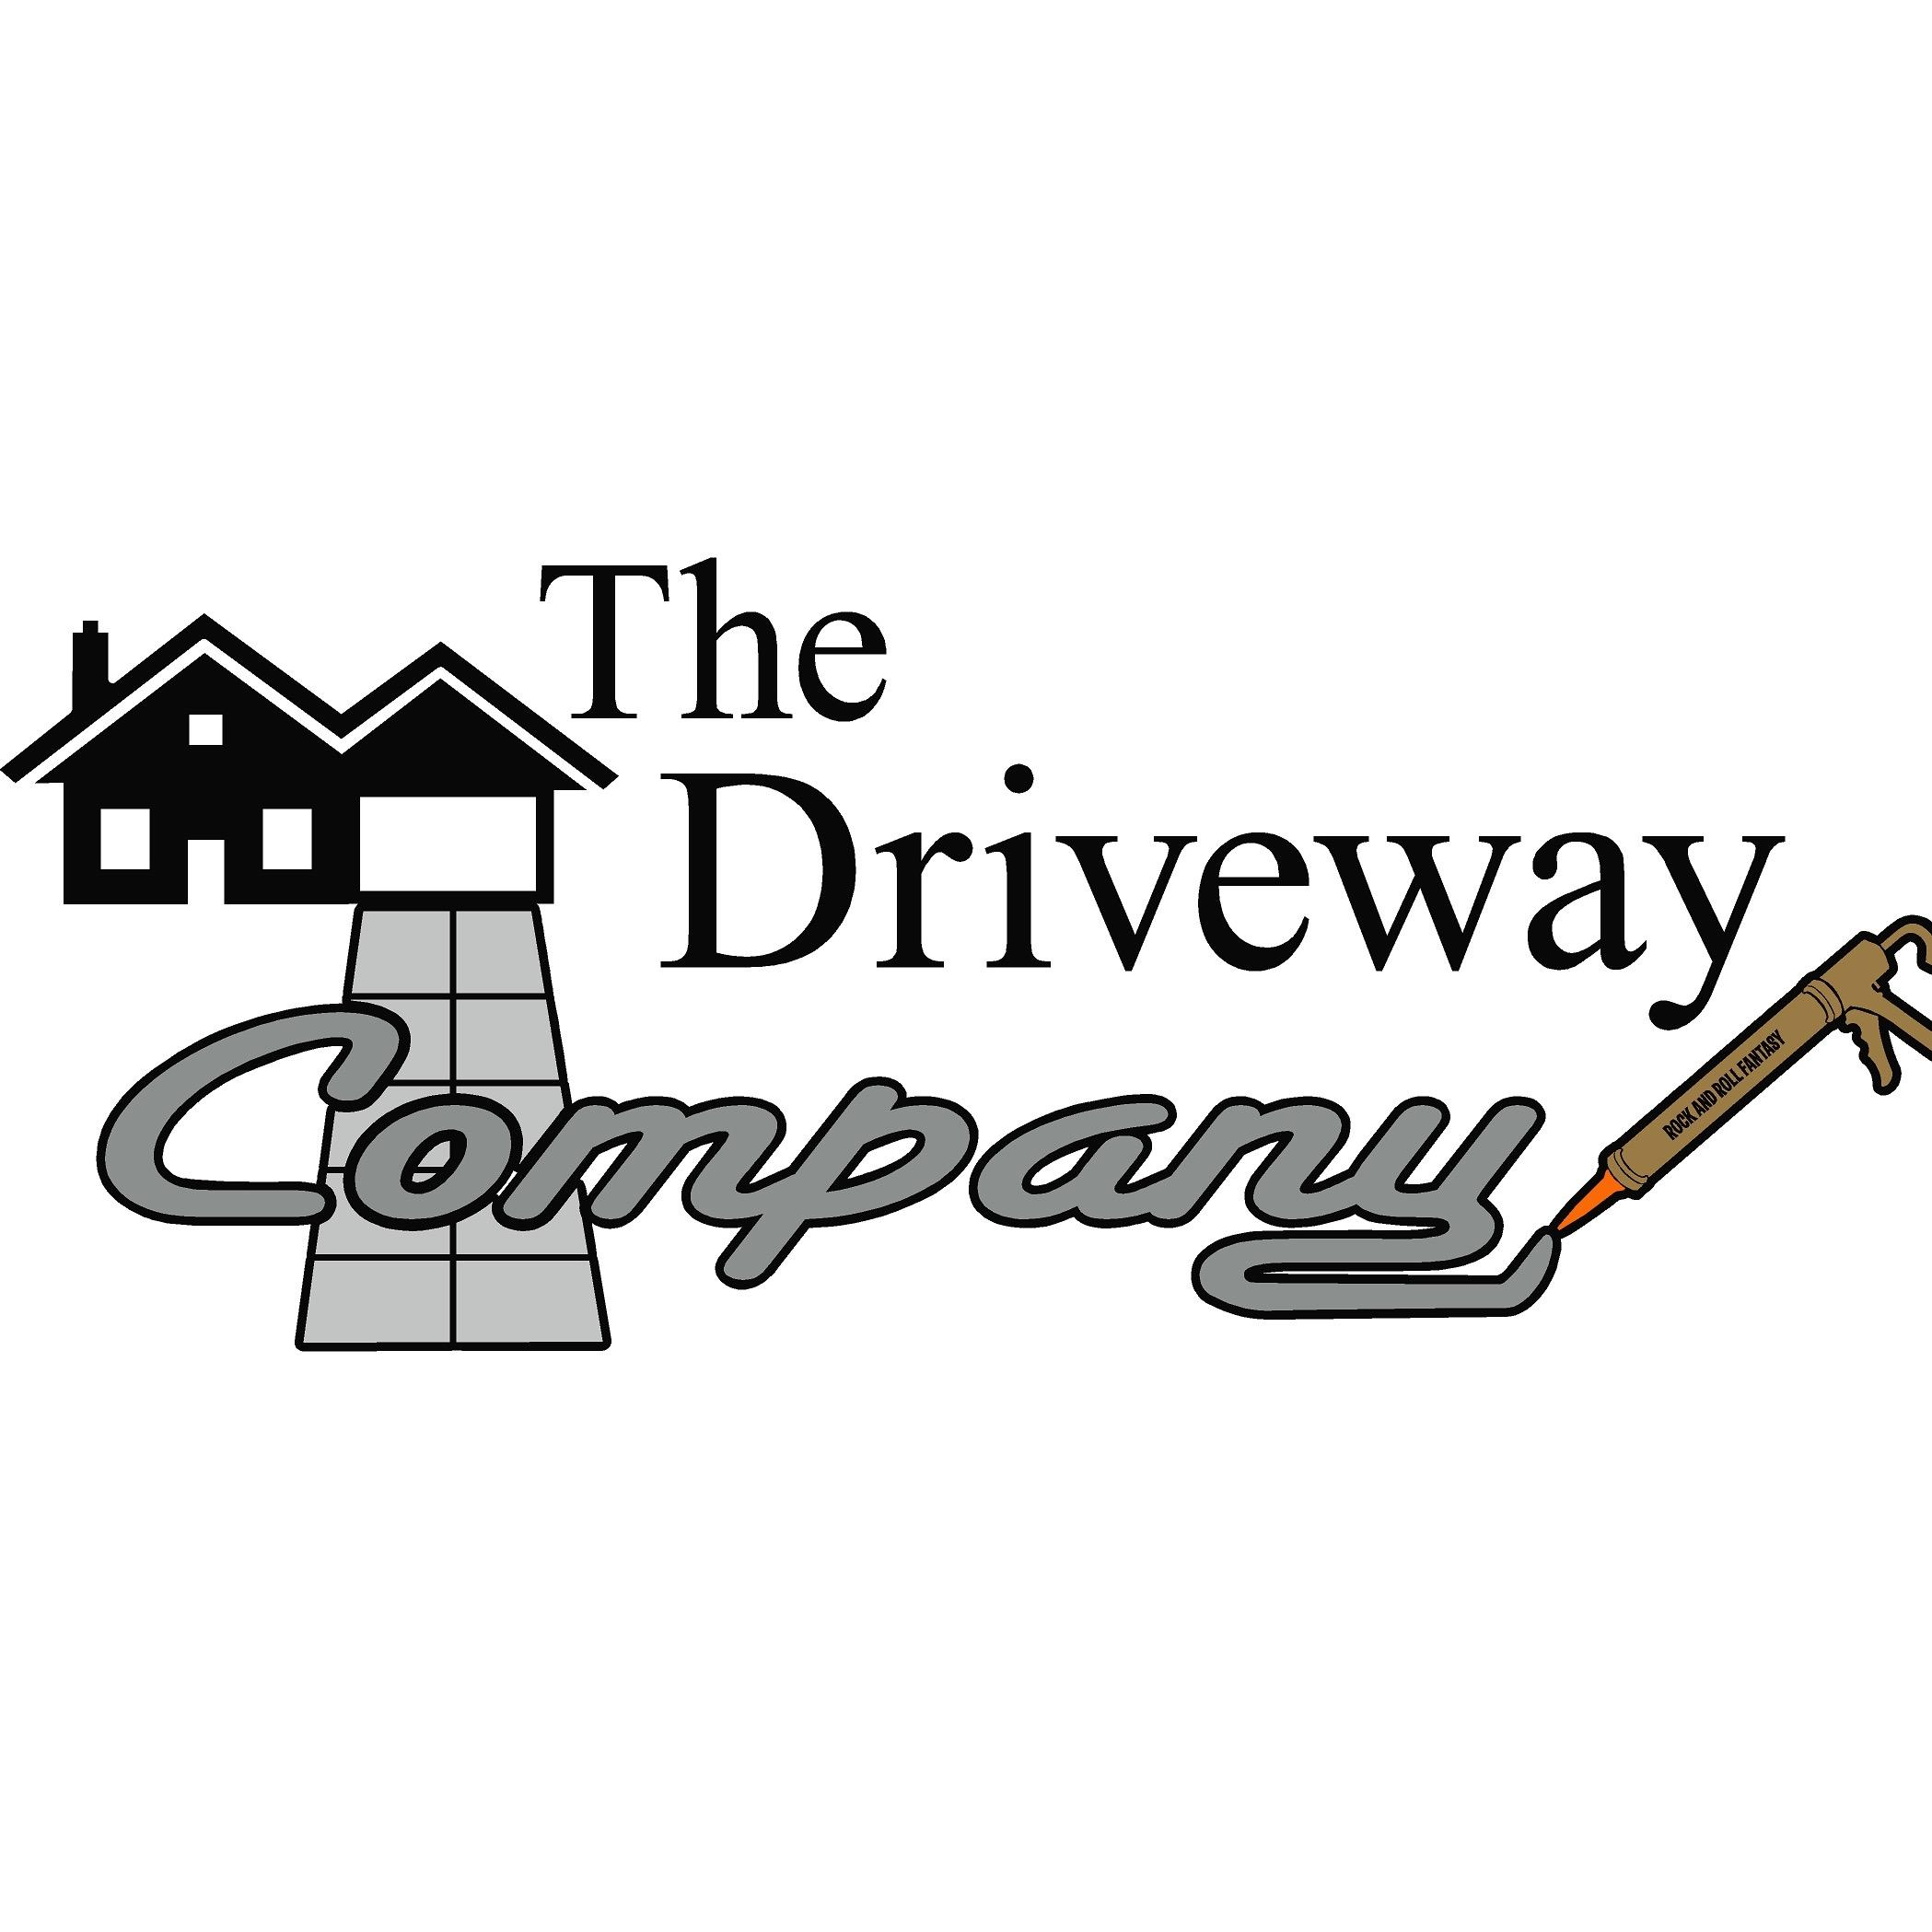 The Driveway Company